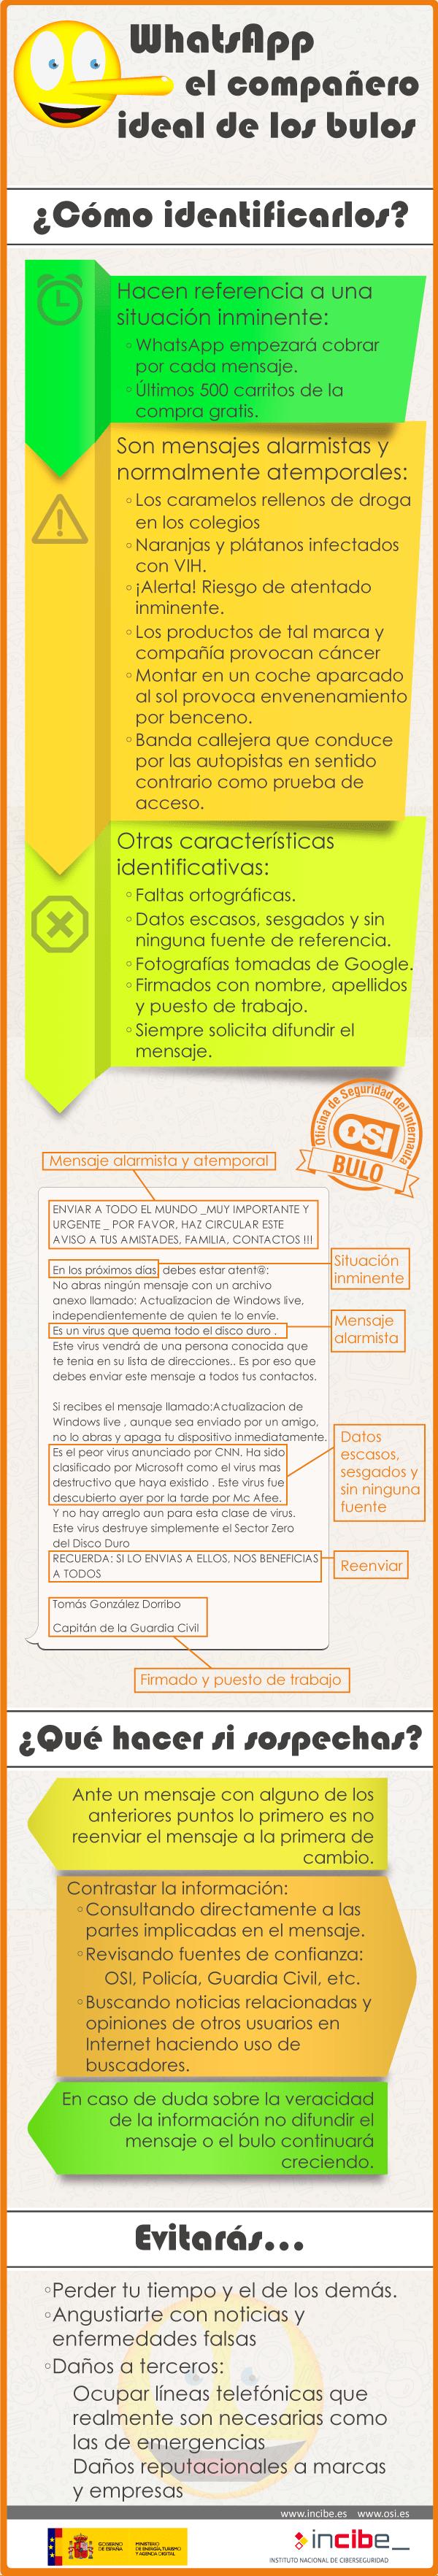 infografia-bulowhastapp